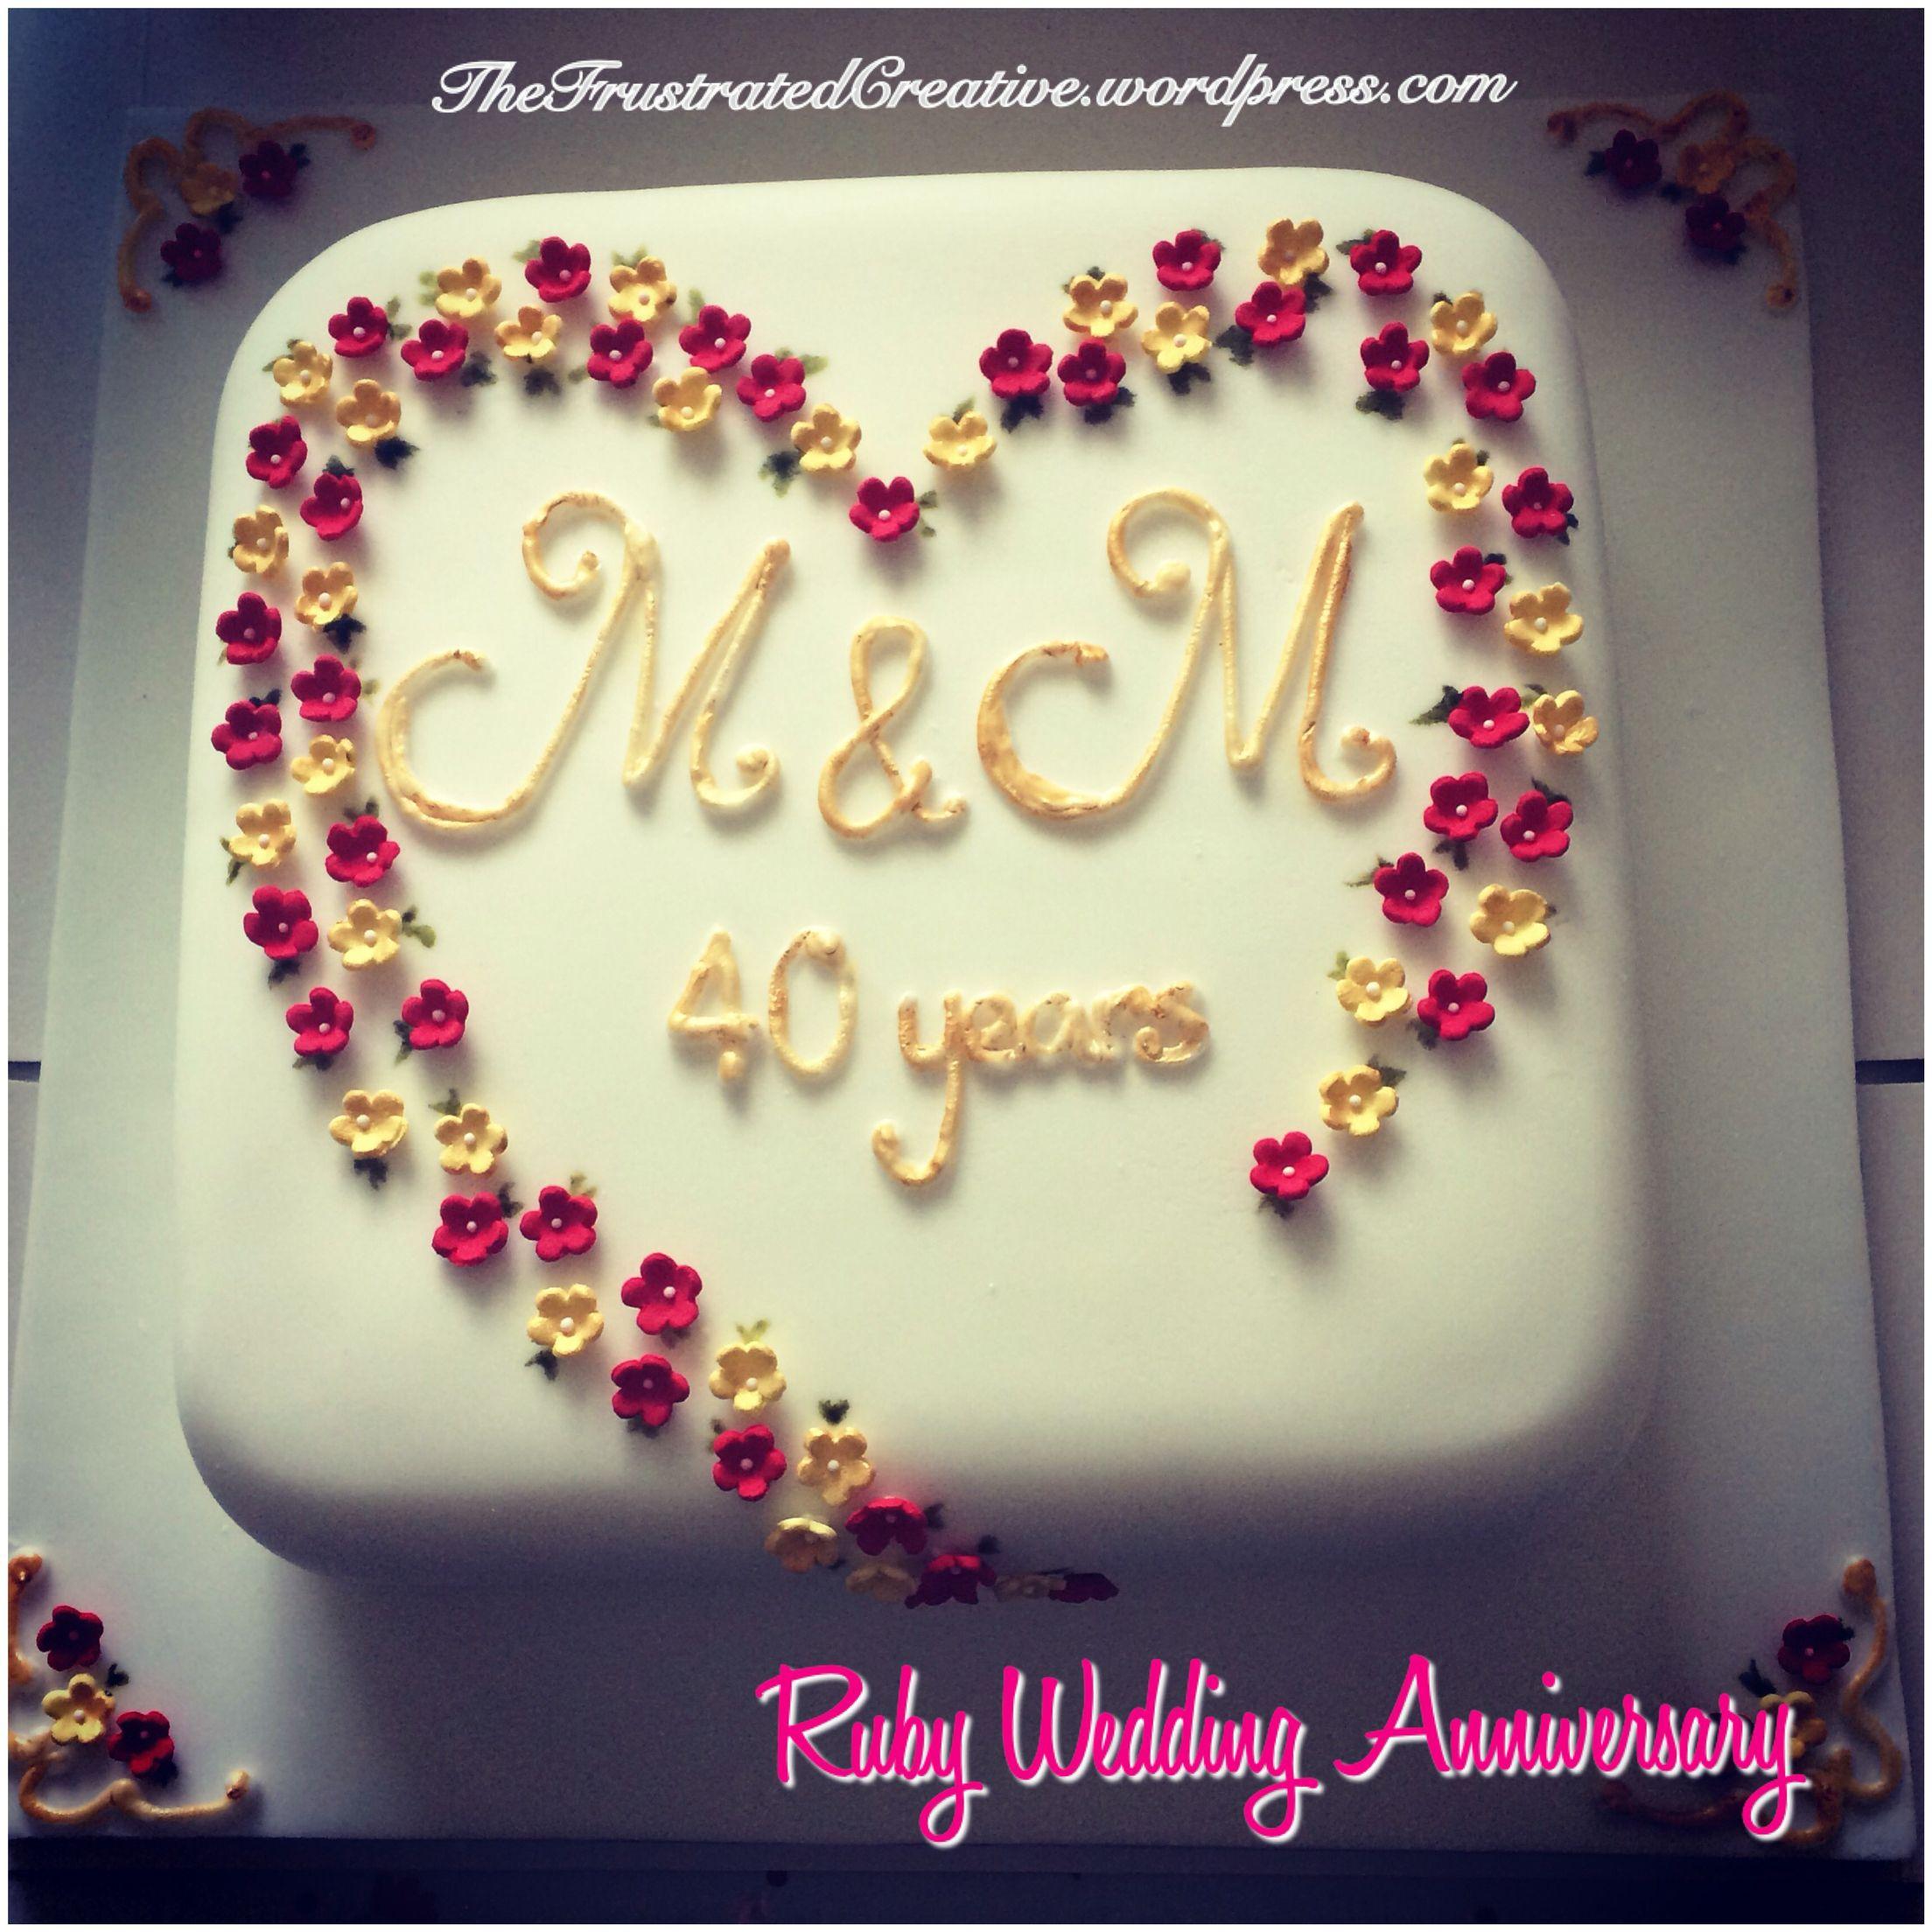 Ruby Wedding Forty Years Anniversary Thefrustratedcreative